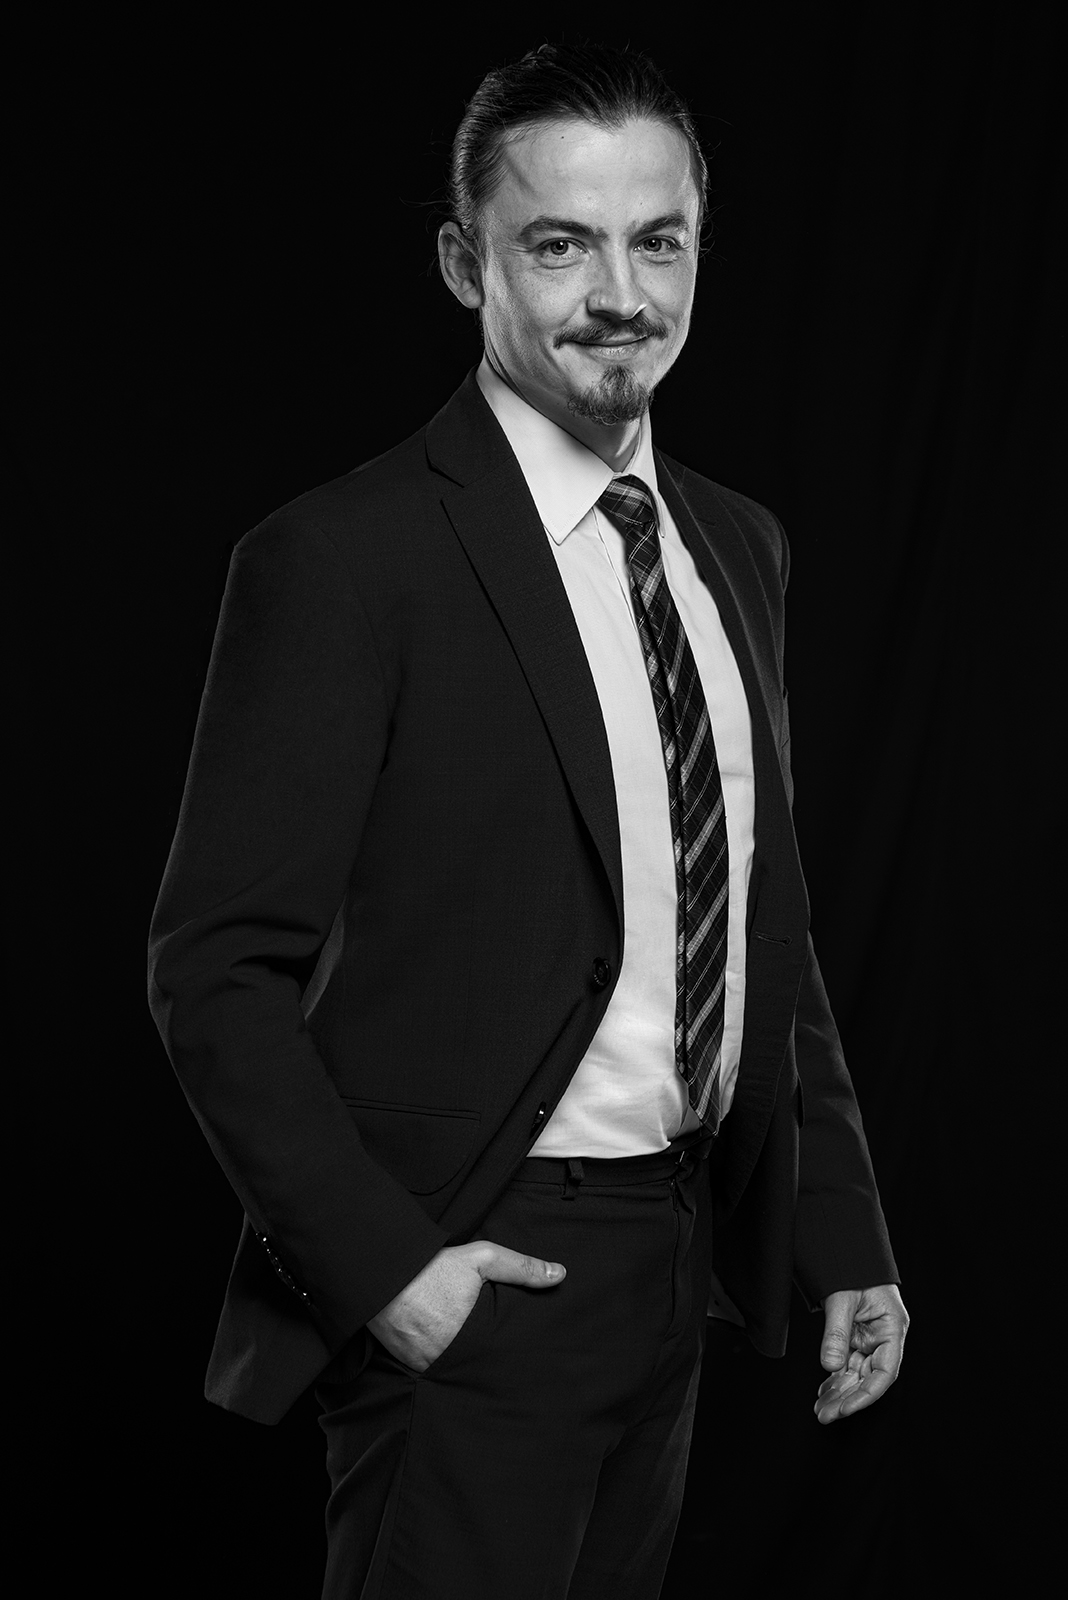 Paweł Jóźwik